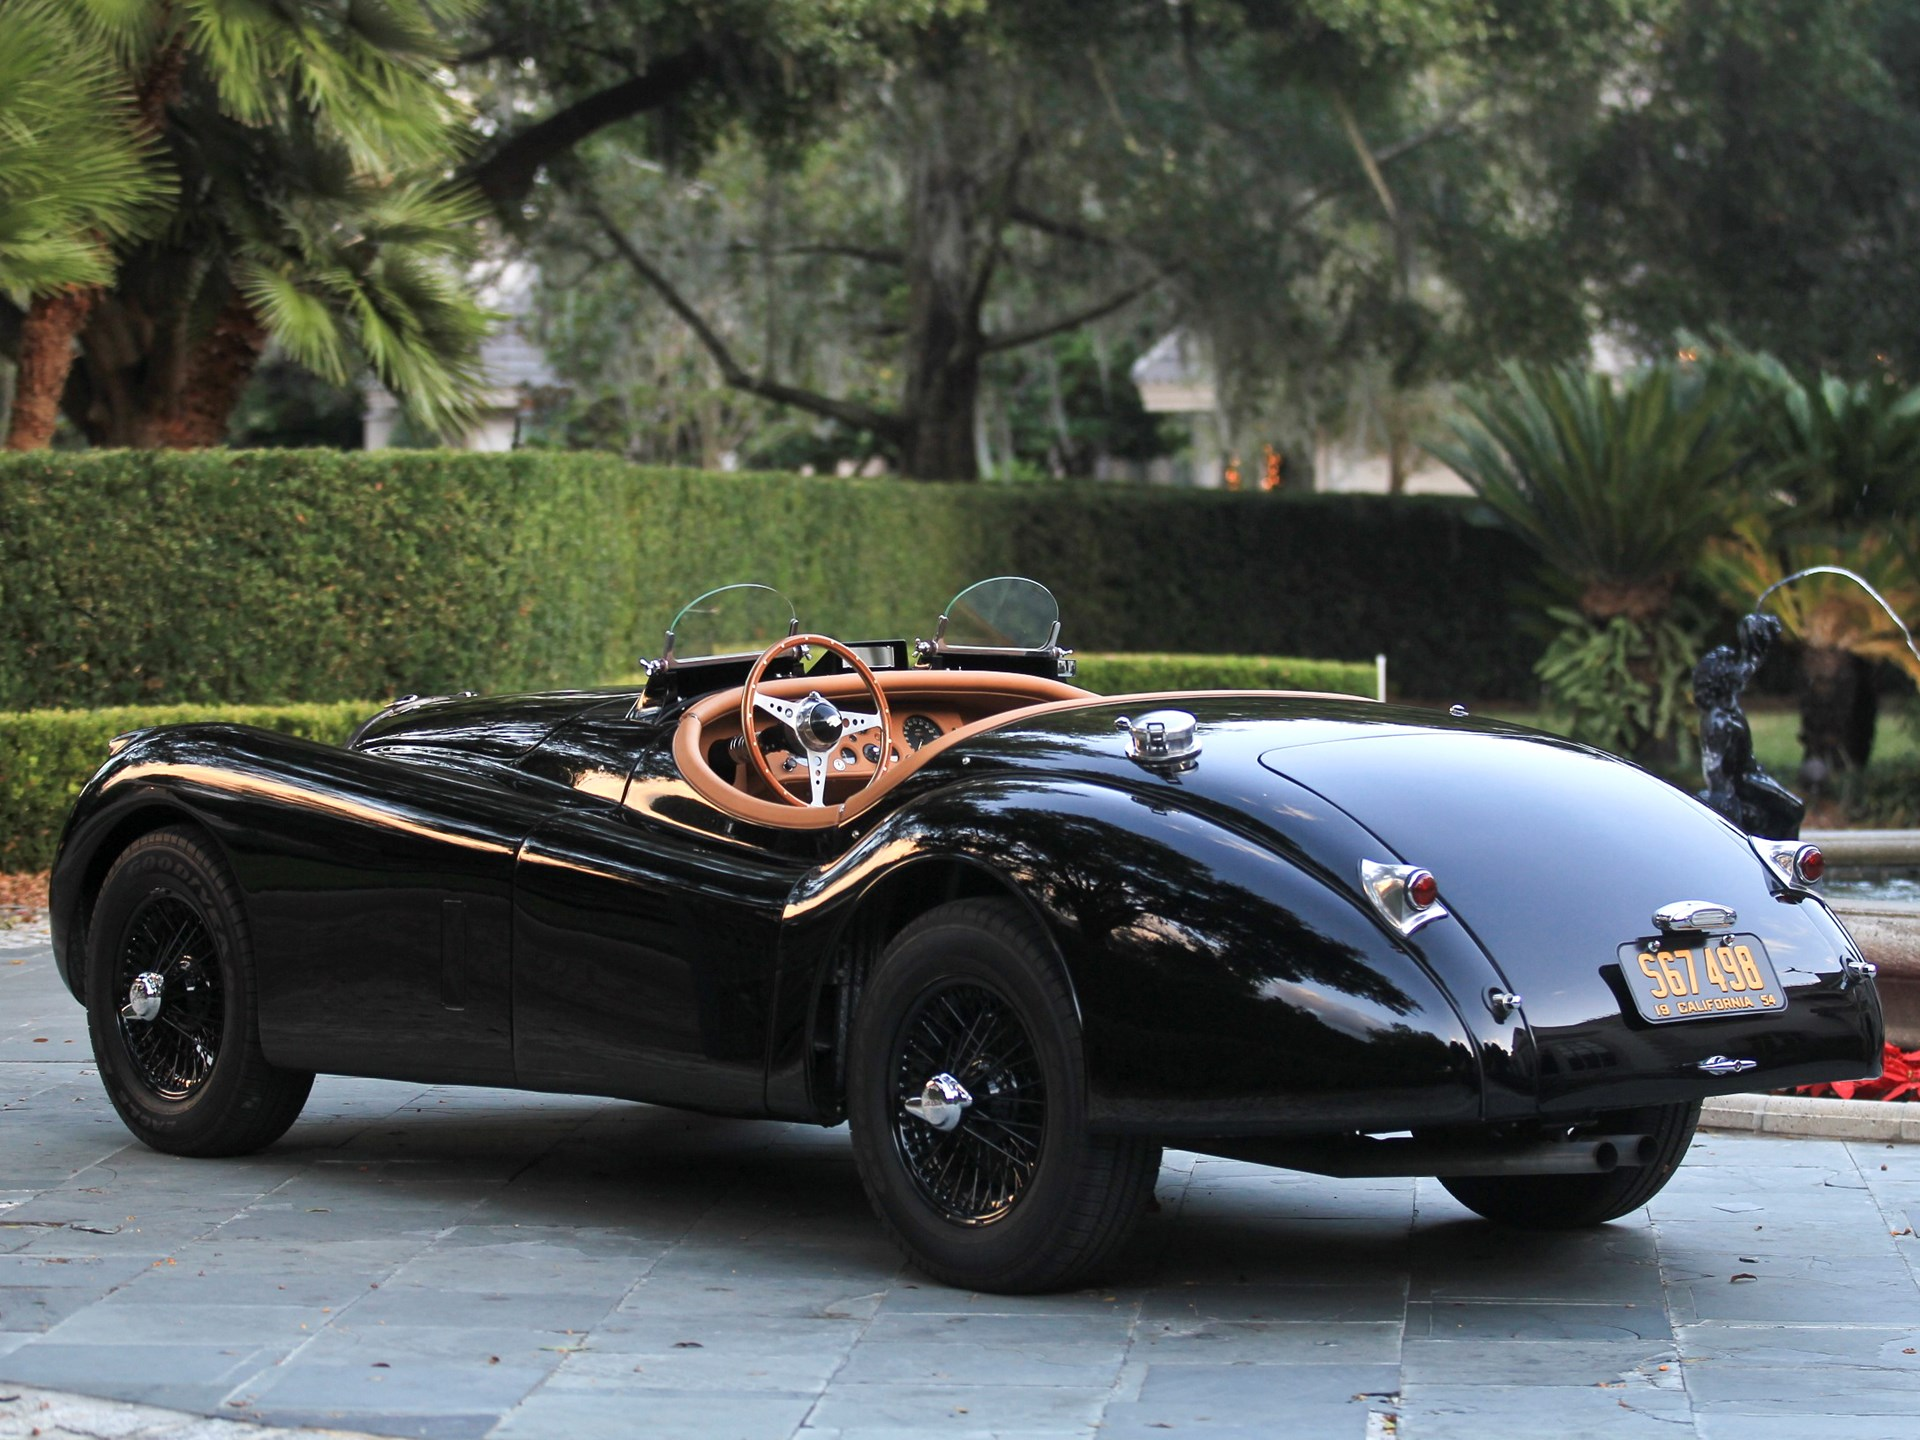 rm sotheby's - 1954 jaguar xk120 se roadster | amelia island 2012